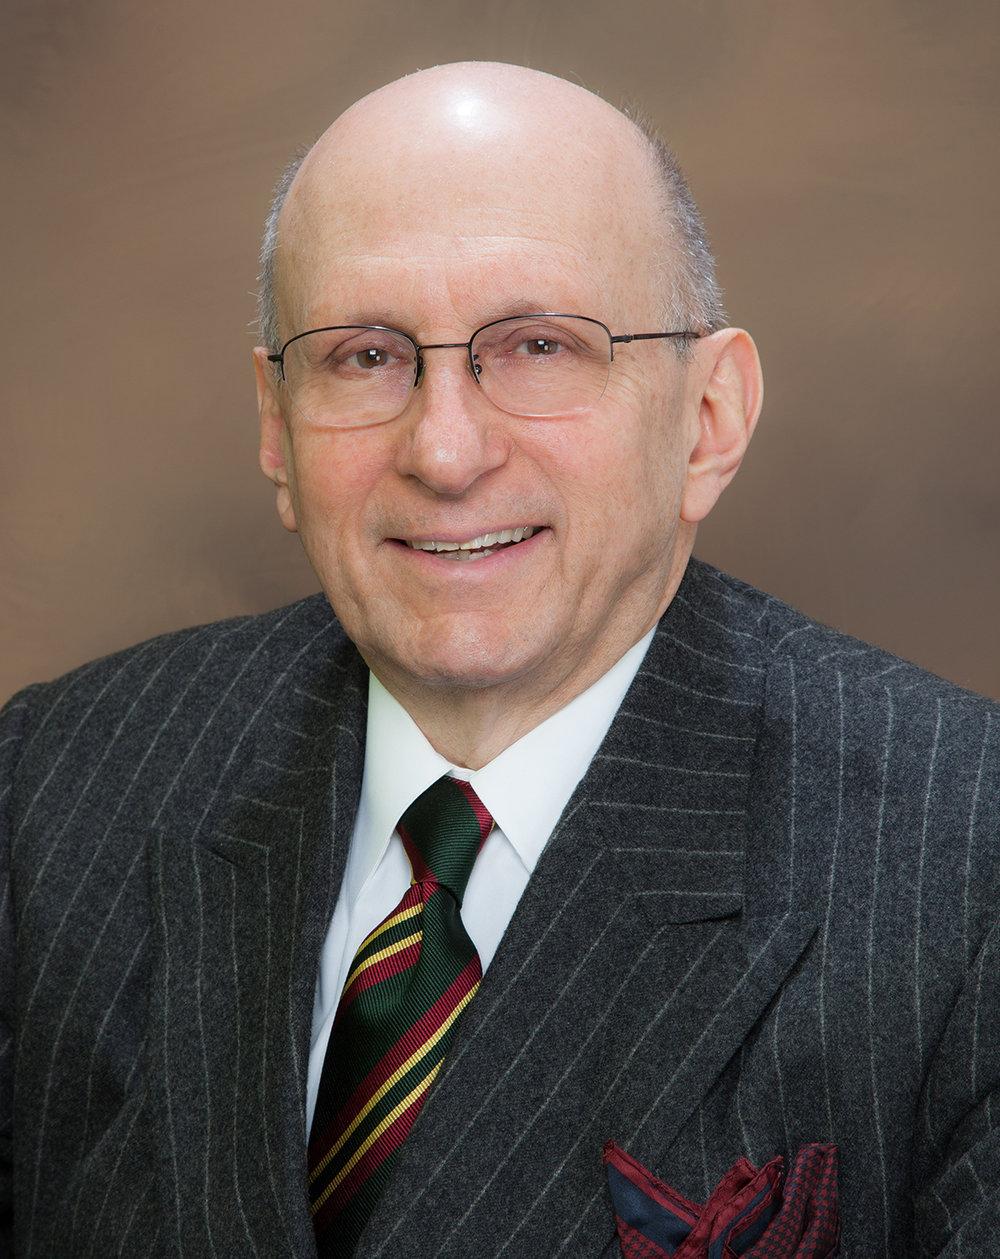 Charles E. Miller  Senior Counsel  cmiller@leichtmanlaw.com  212-419-5210, ext. 702 516-641-3378 (mobile)